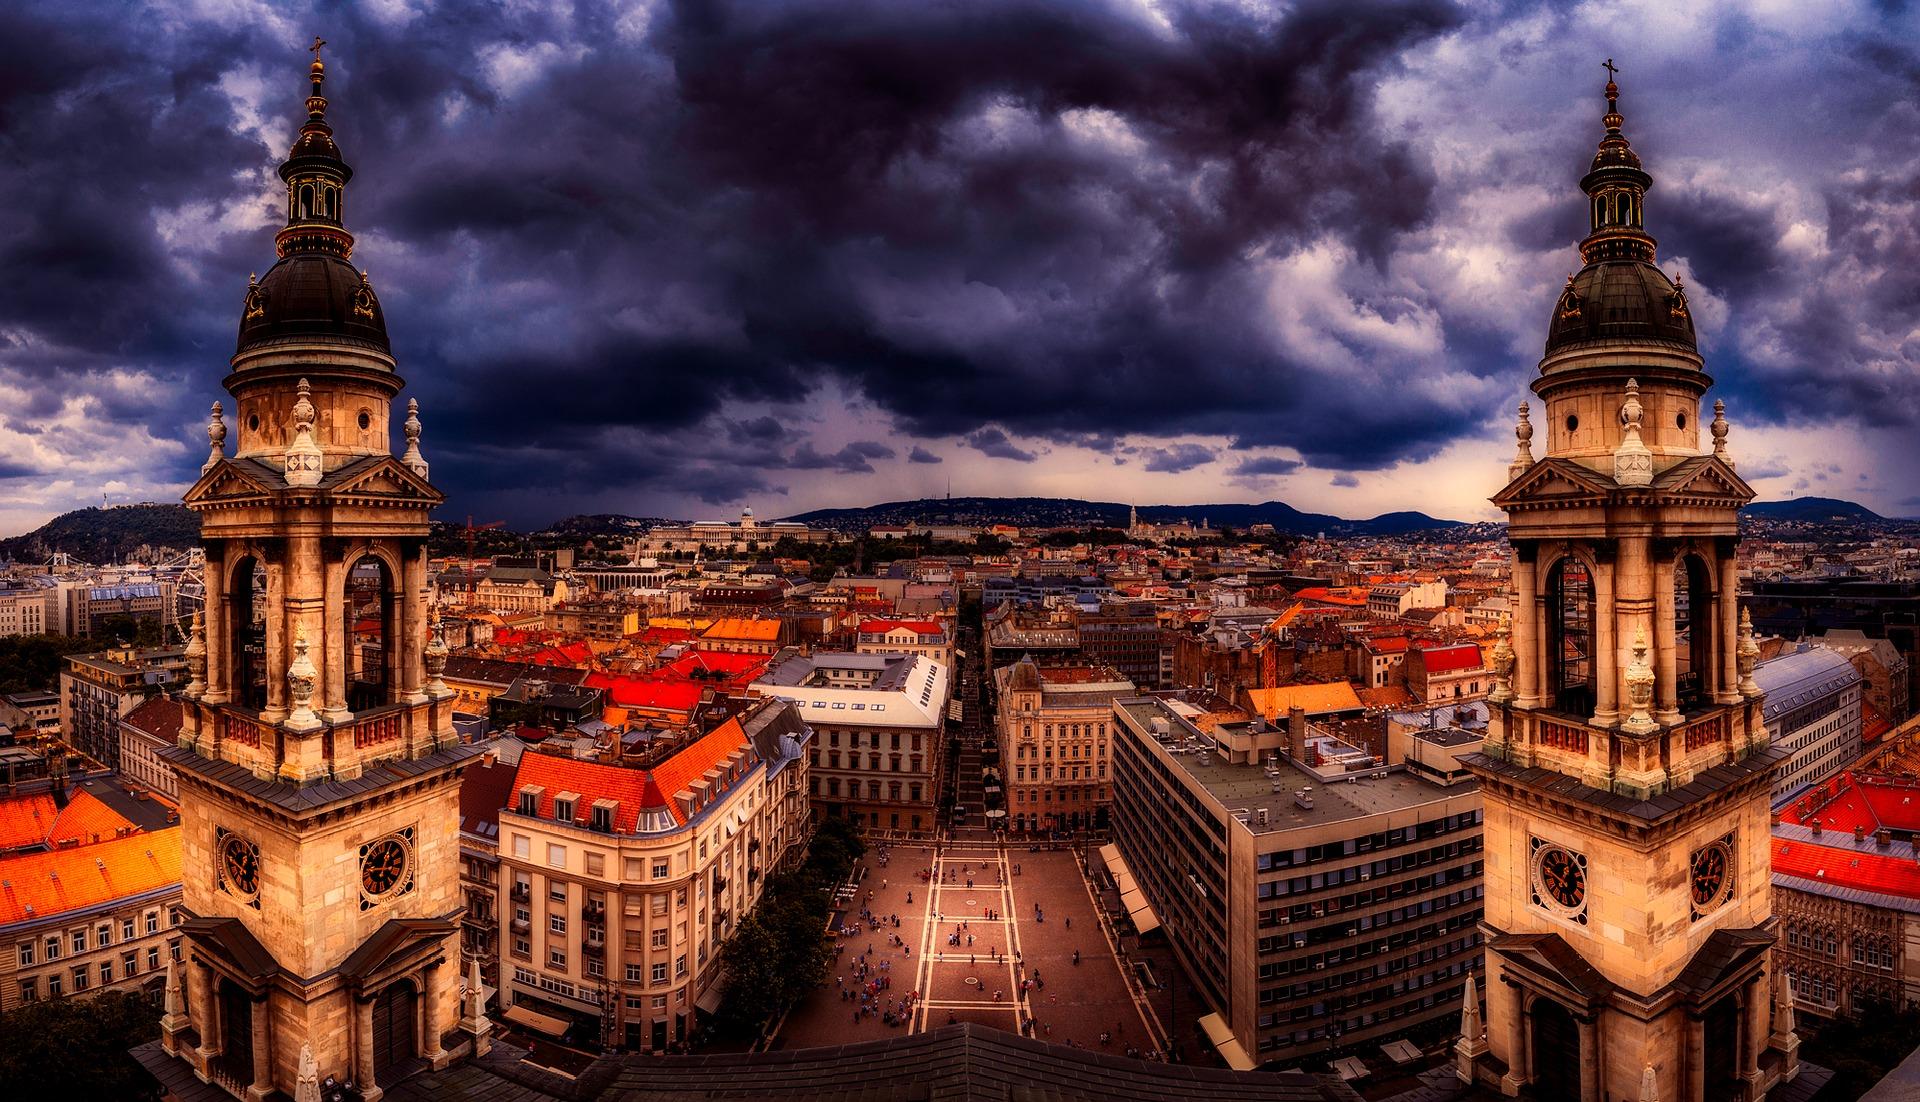 budapest-2420749_1920.jpg